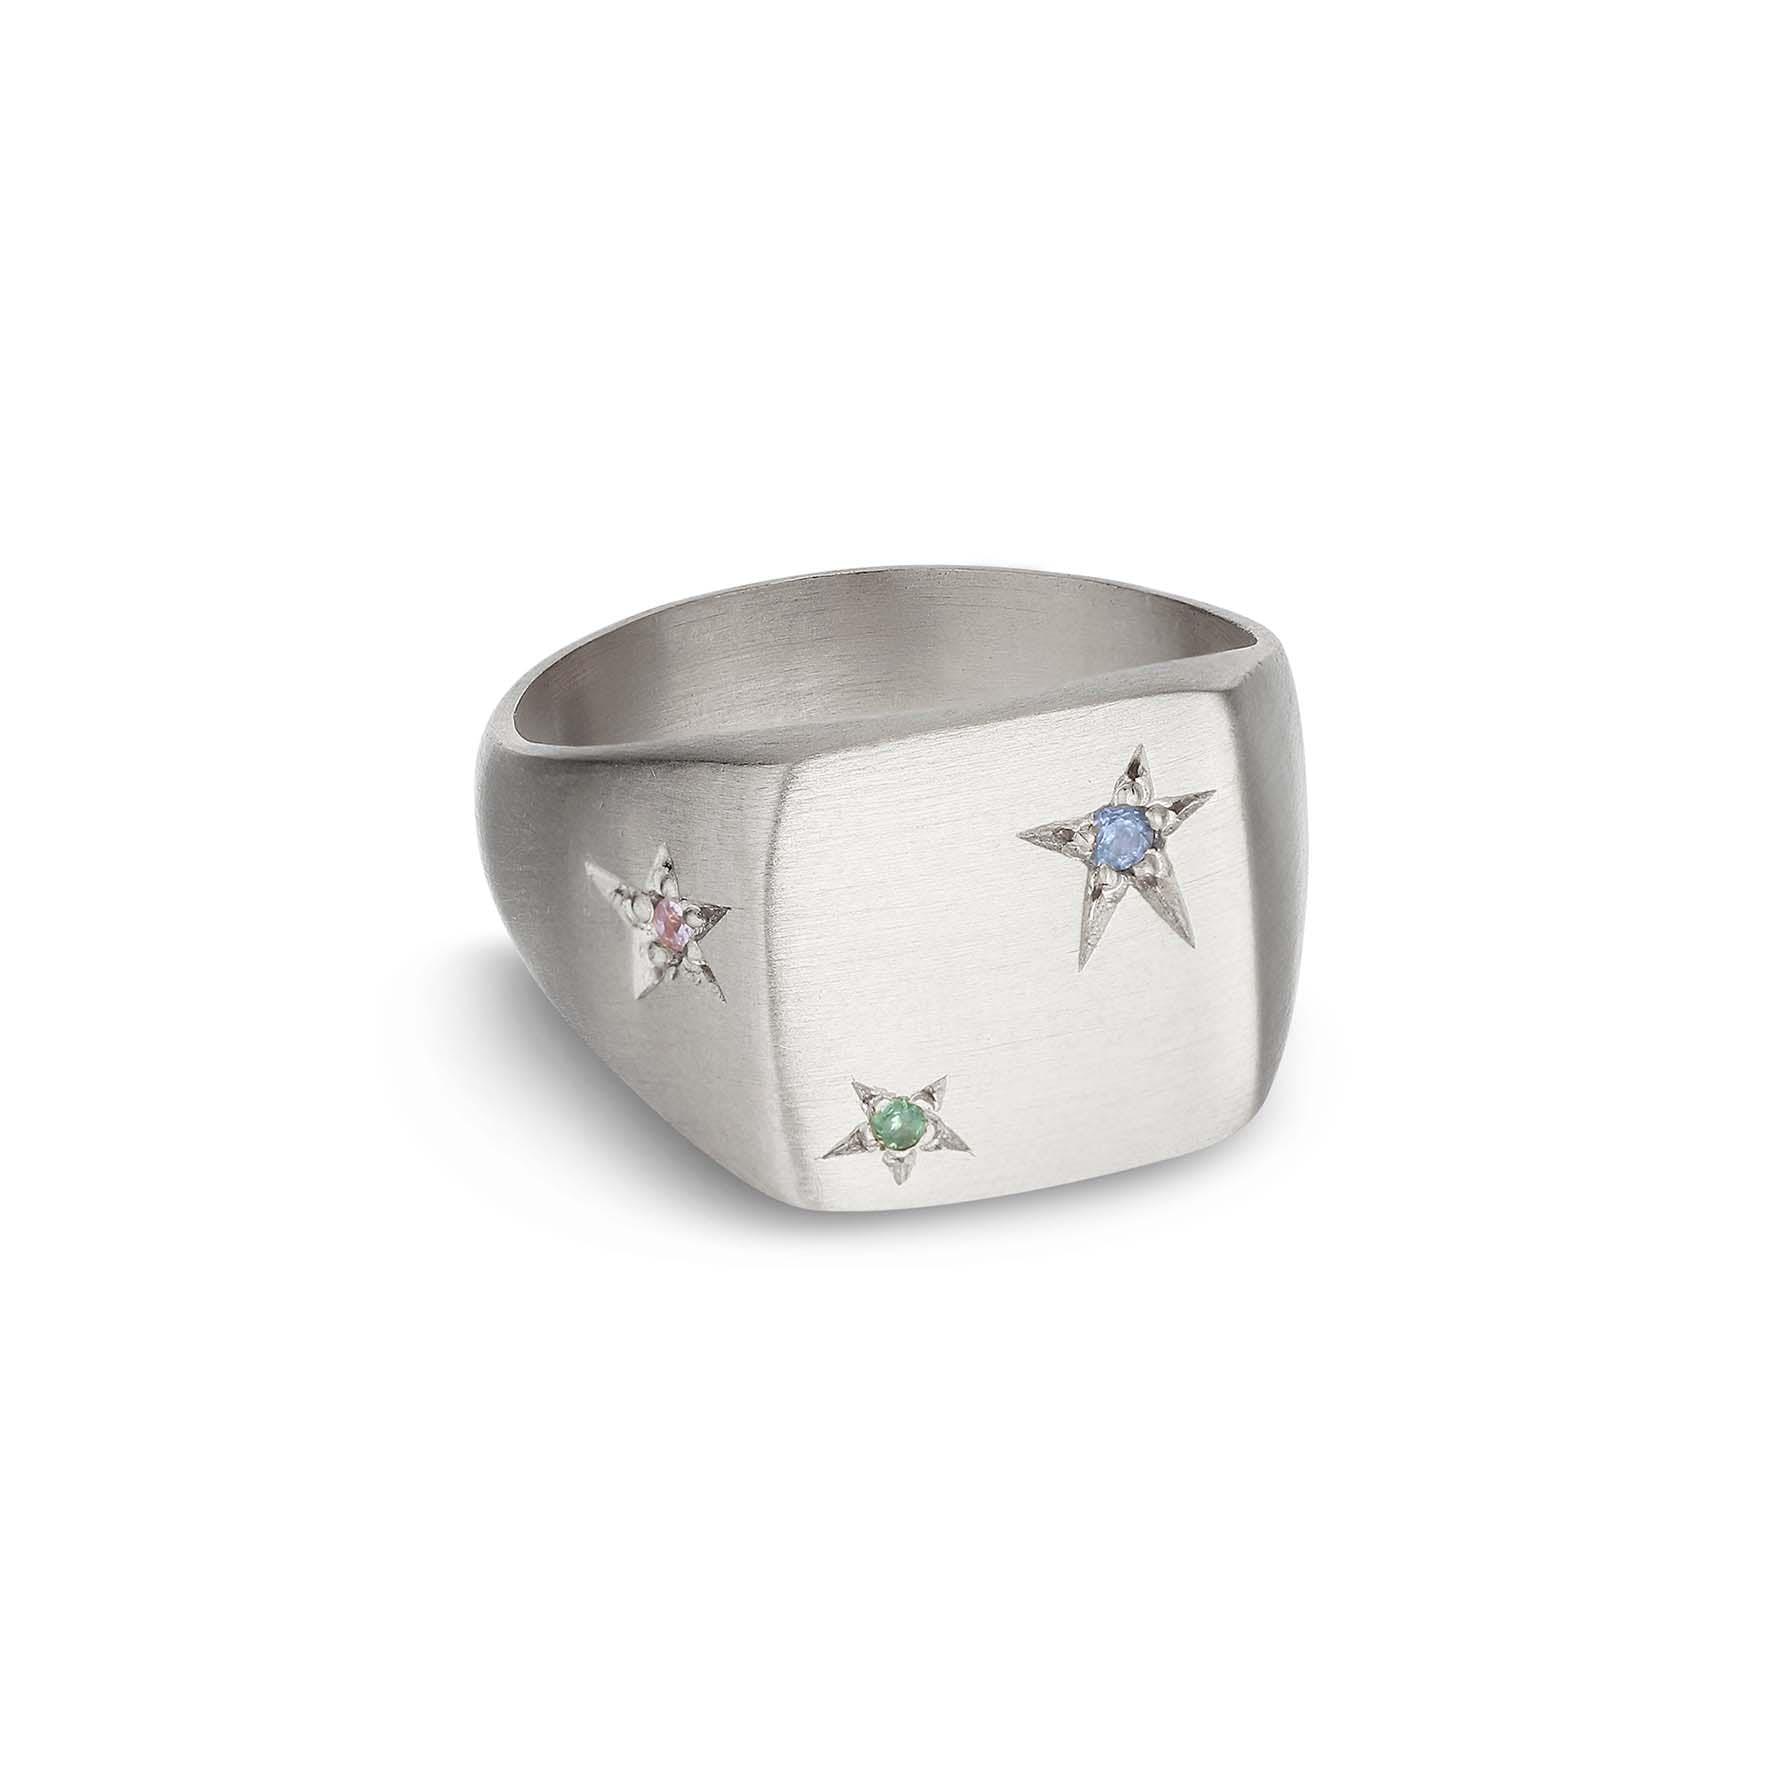 Star Signet Ring von Jane Kønig in Silber Sterling 925